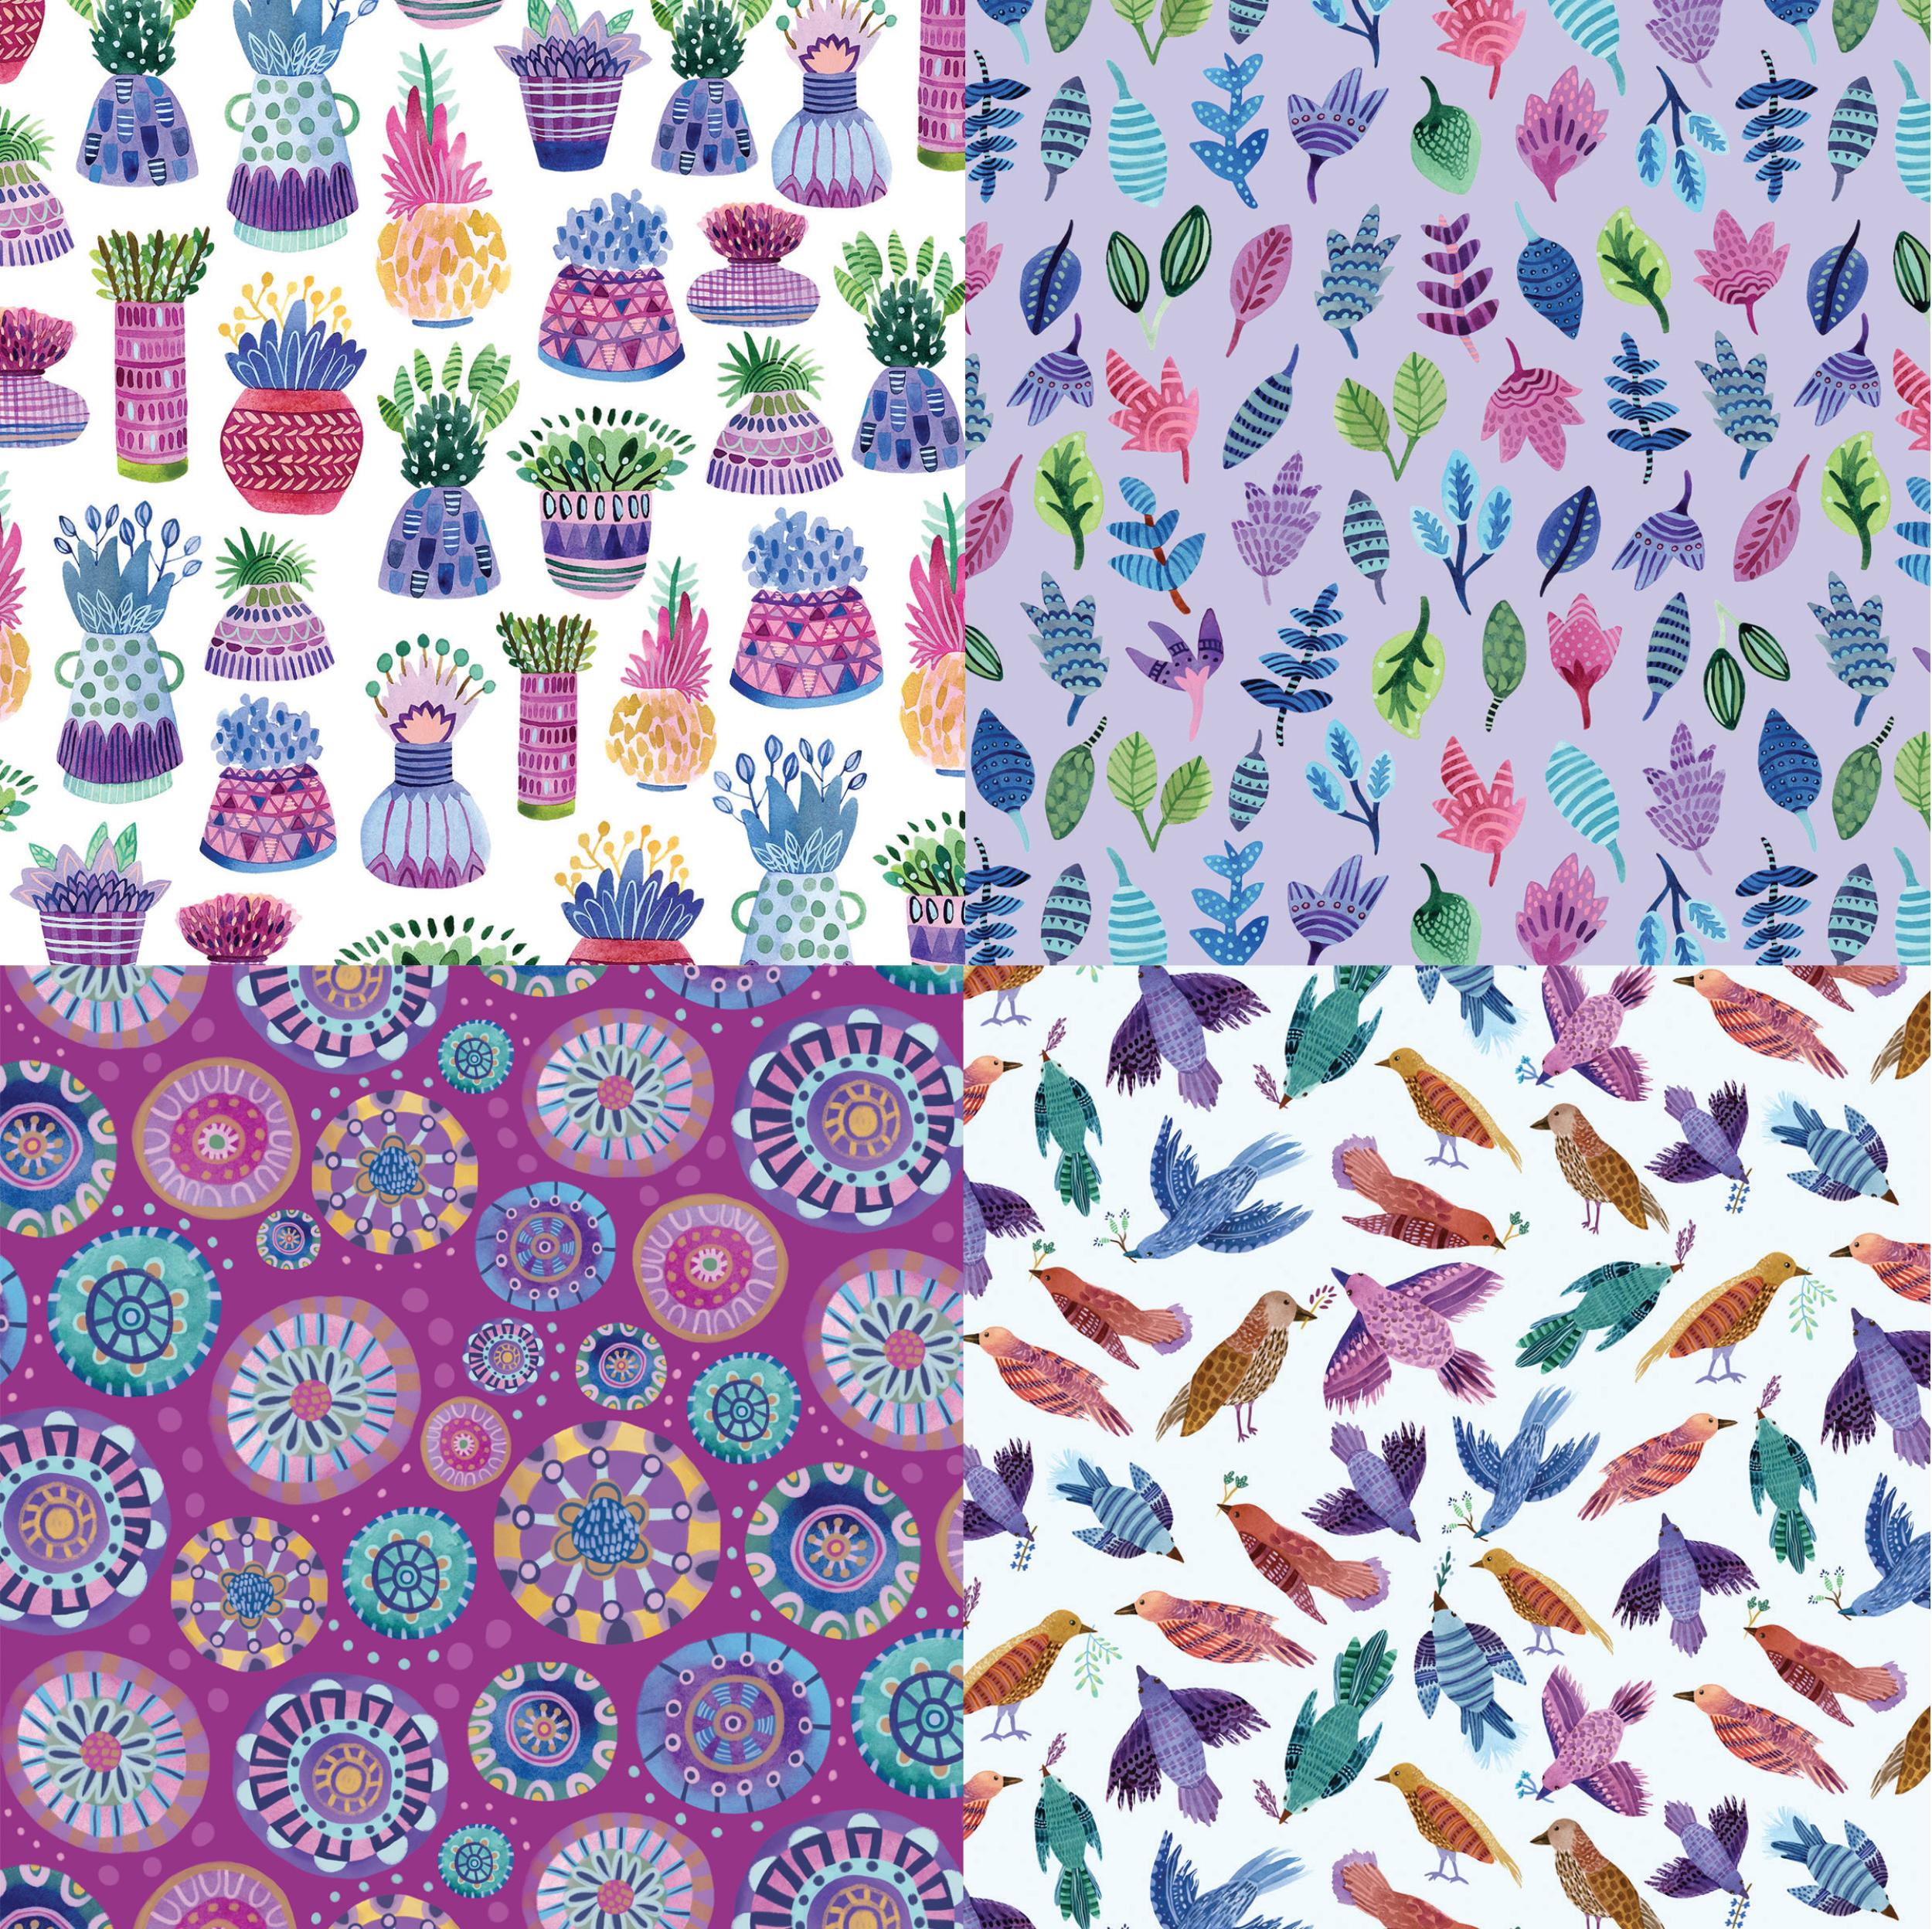 mia winner patterns.jpg